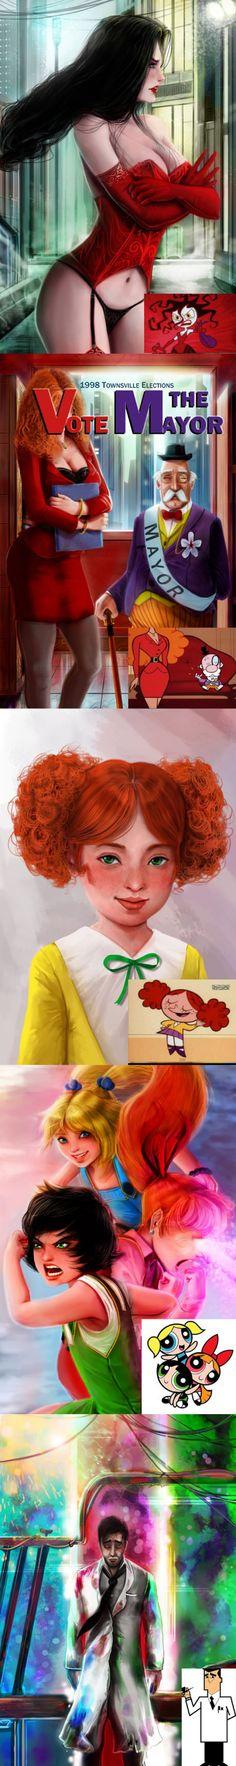 Powerpuff Girls- Realistic Character Artworks